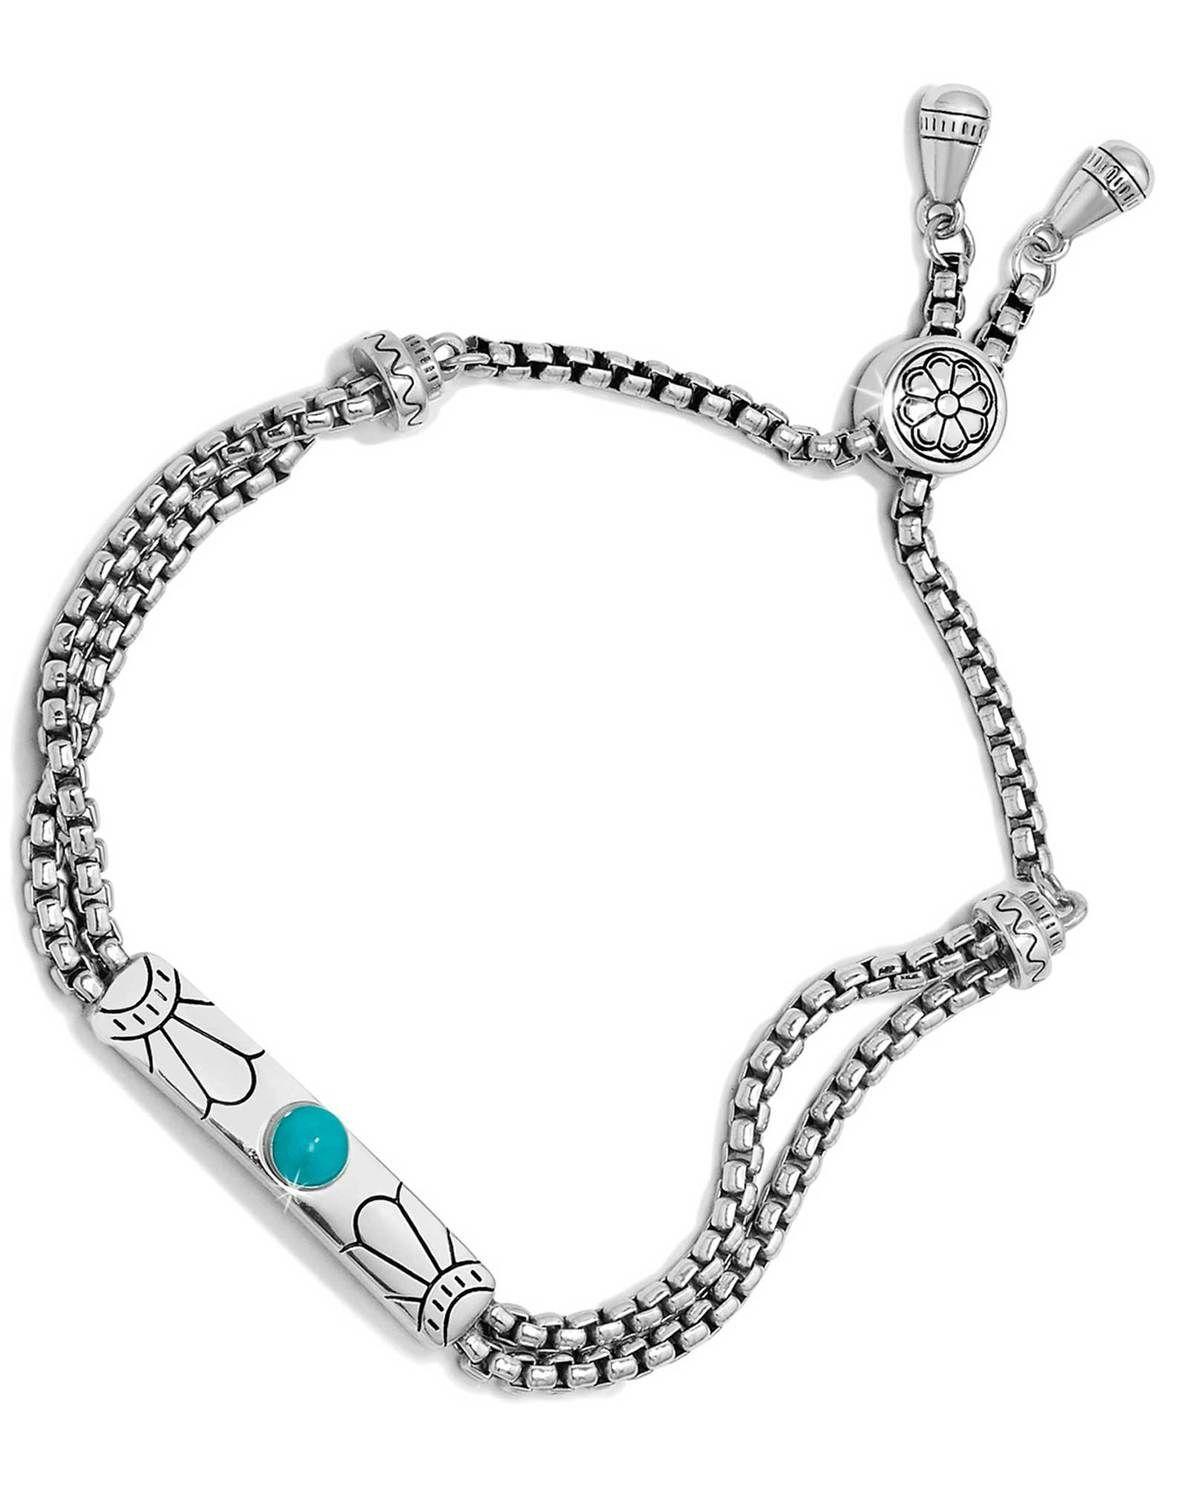 11+ Where to buy brighton jewelry near me viral